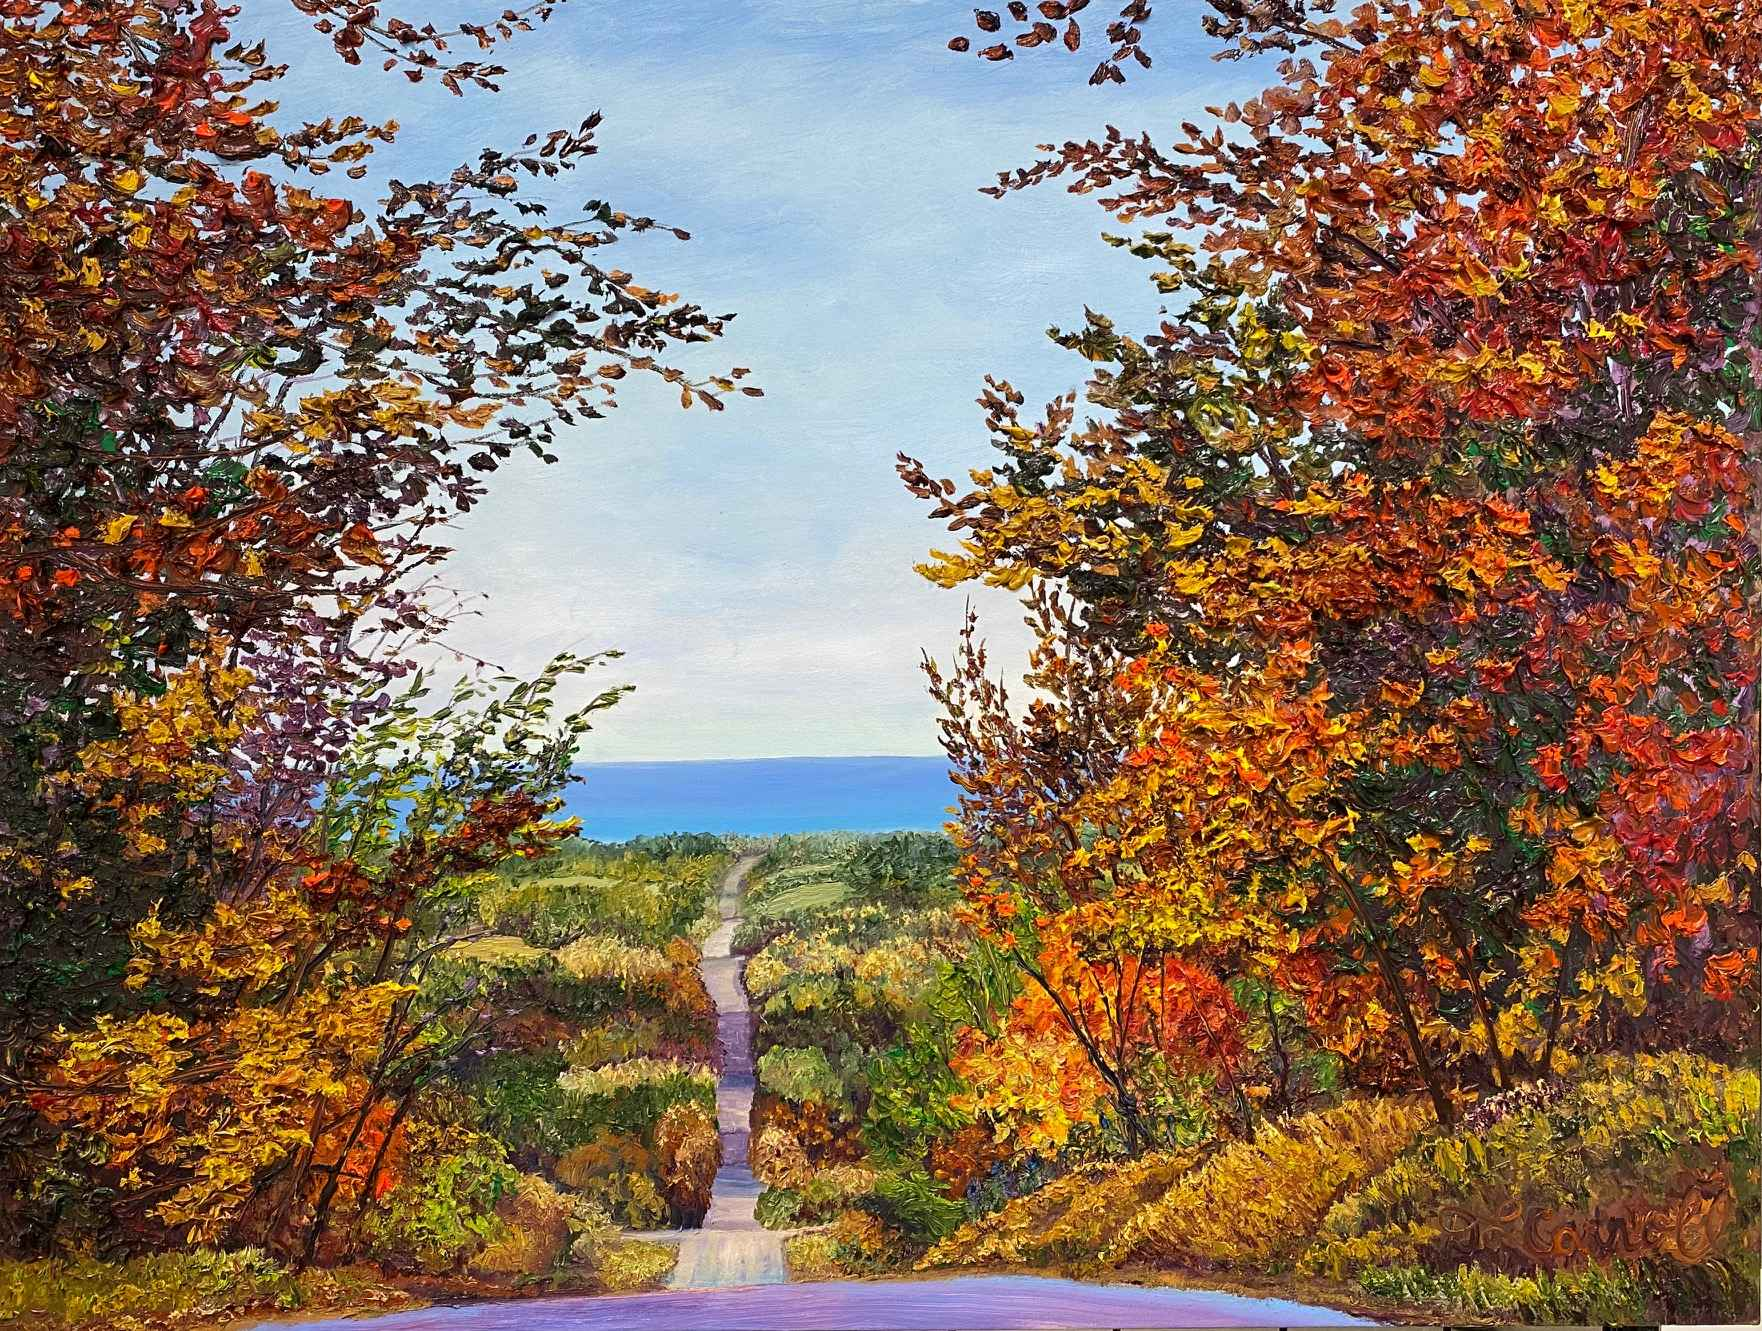 Downhill to the Bay by Ms Debra Lynn Carroll - Masterpiece Online